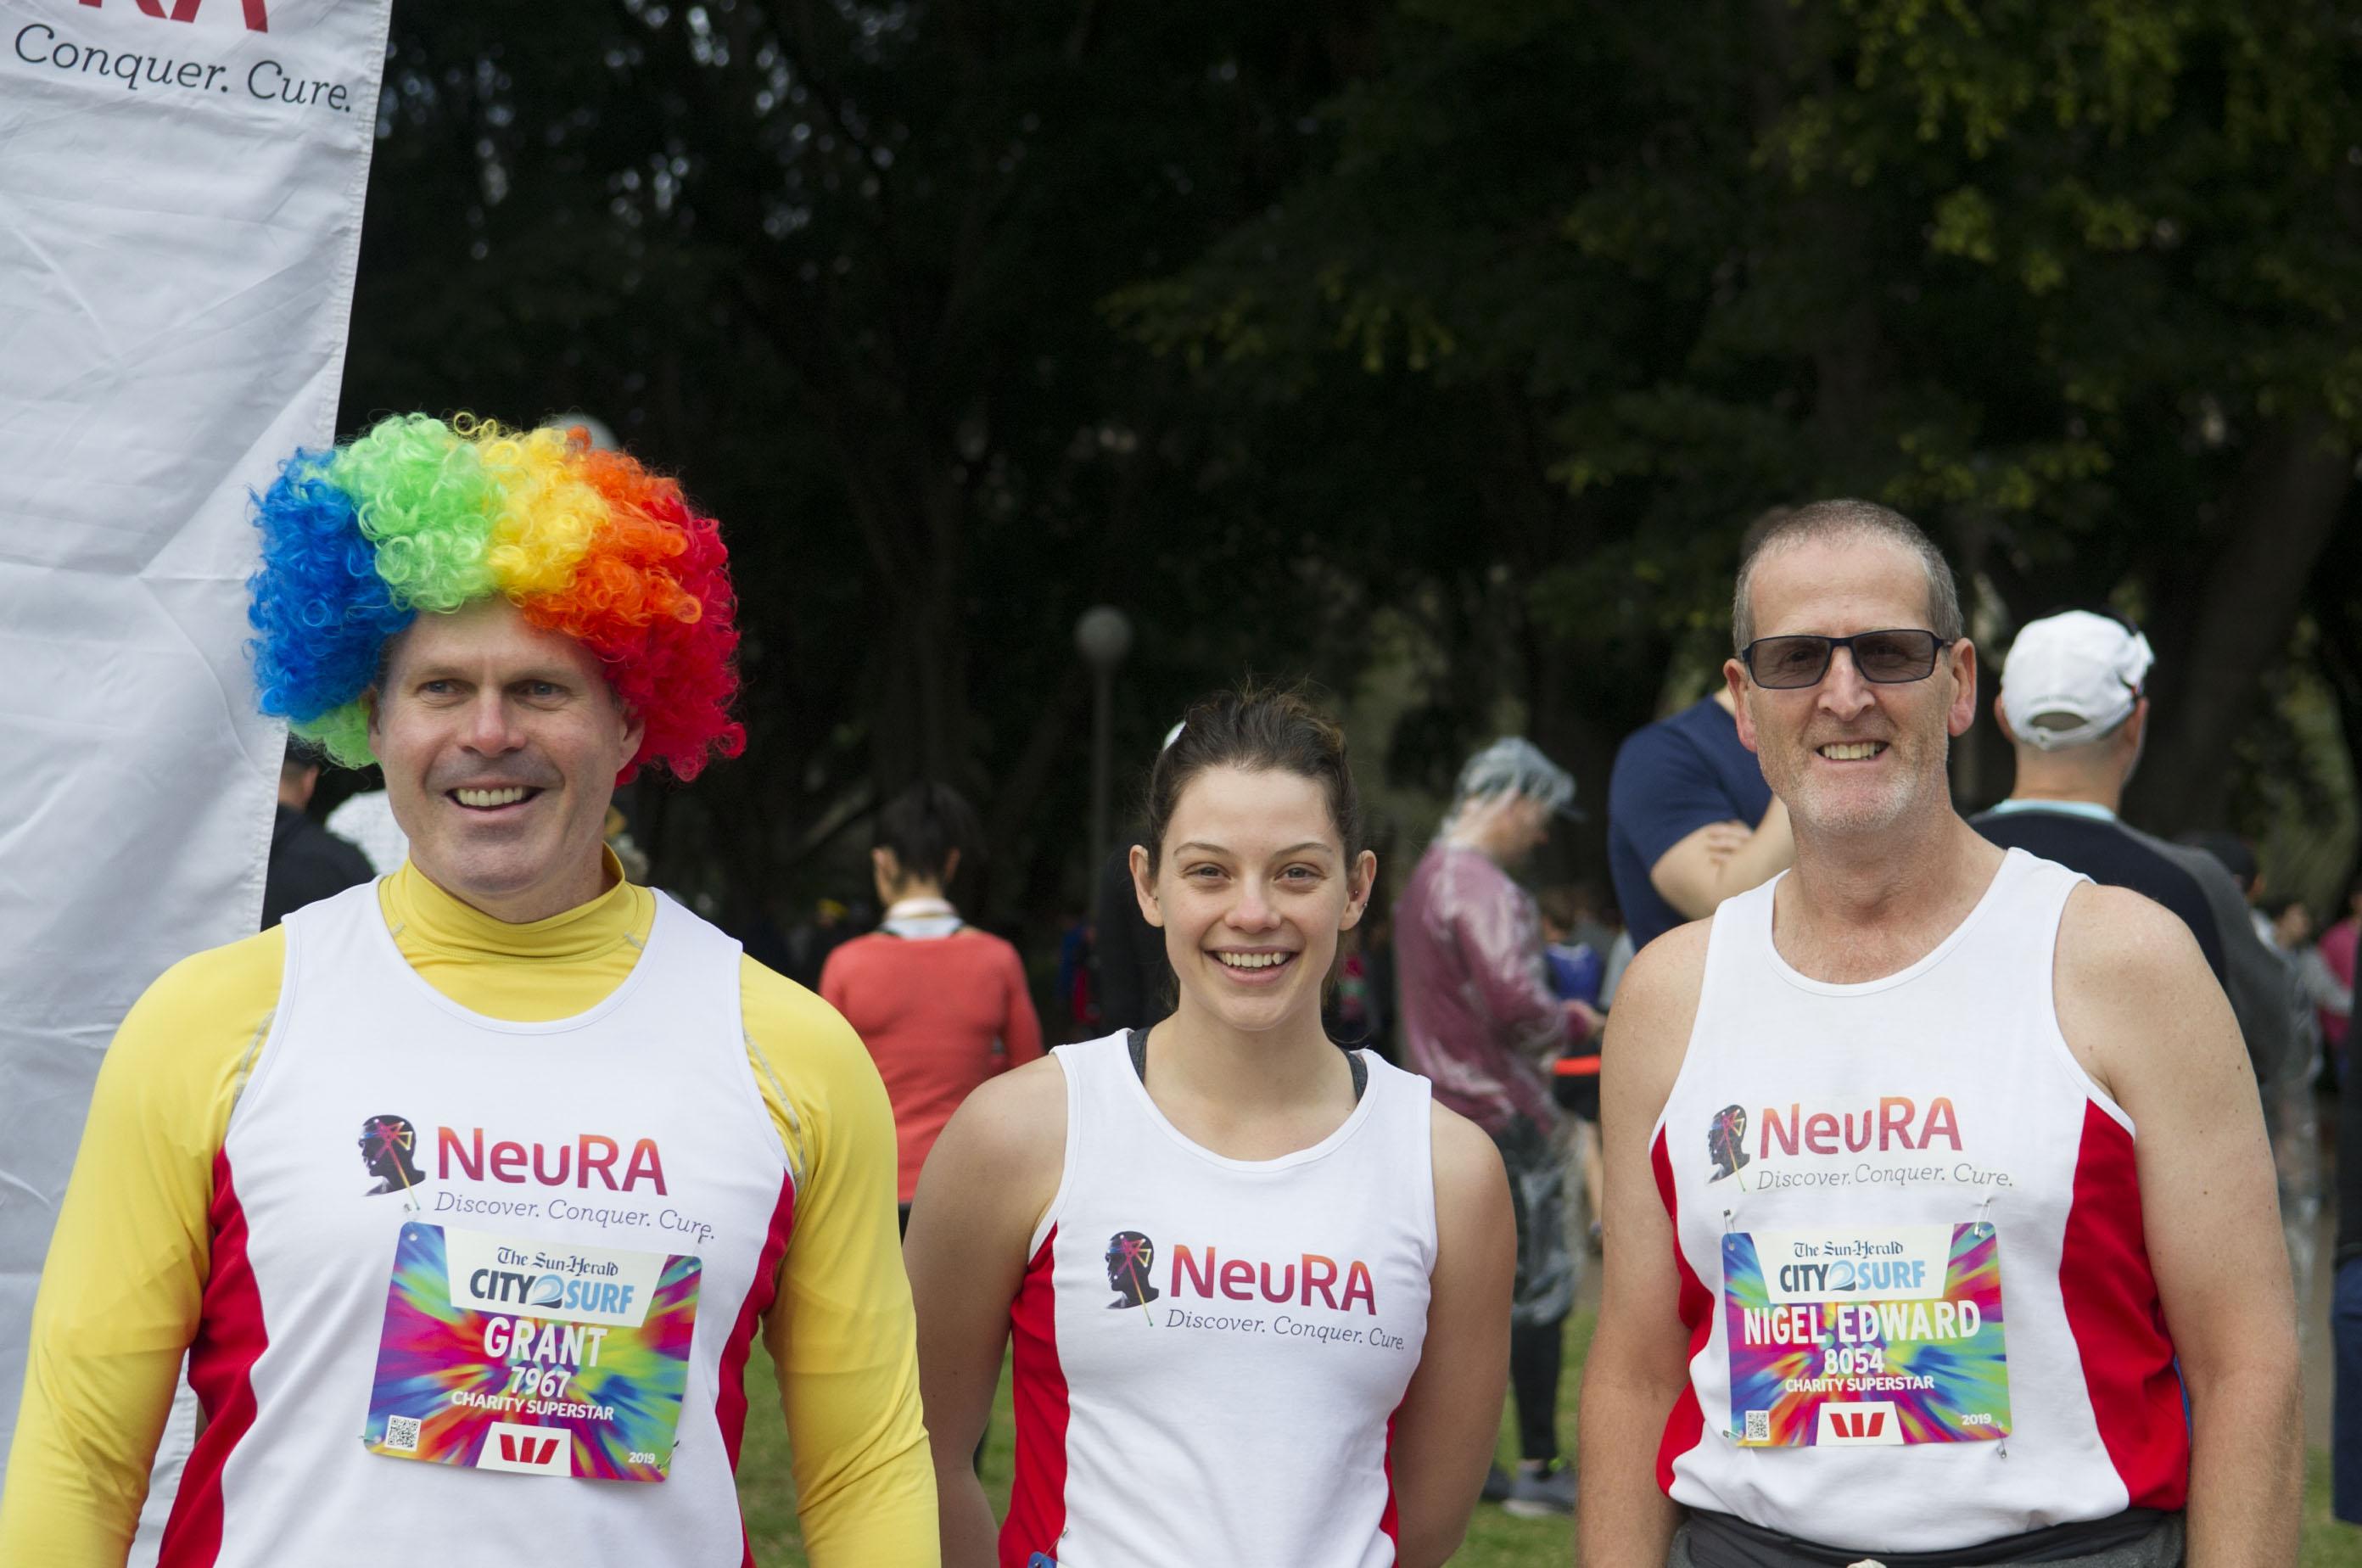 NeuRA Charity Superstars Grant Simpson, Bess Stewart and Nigel Walker